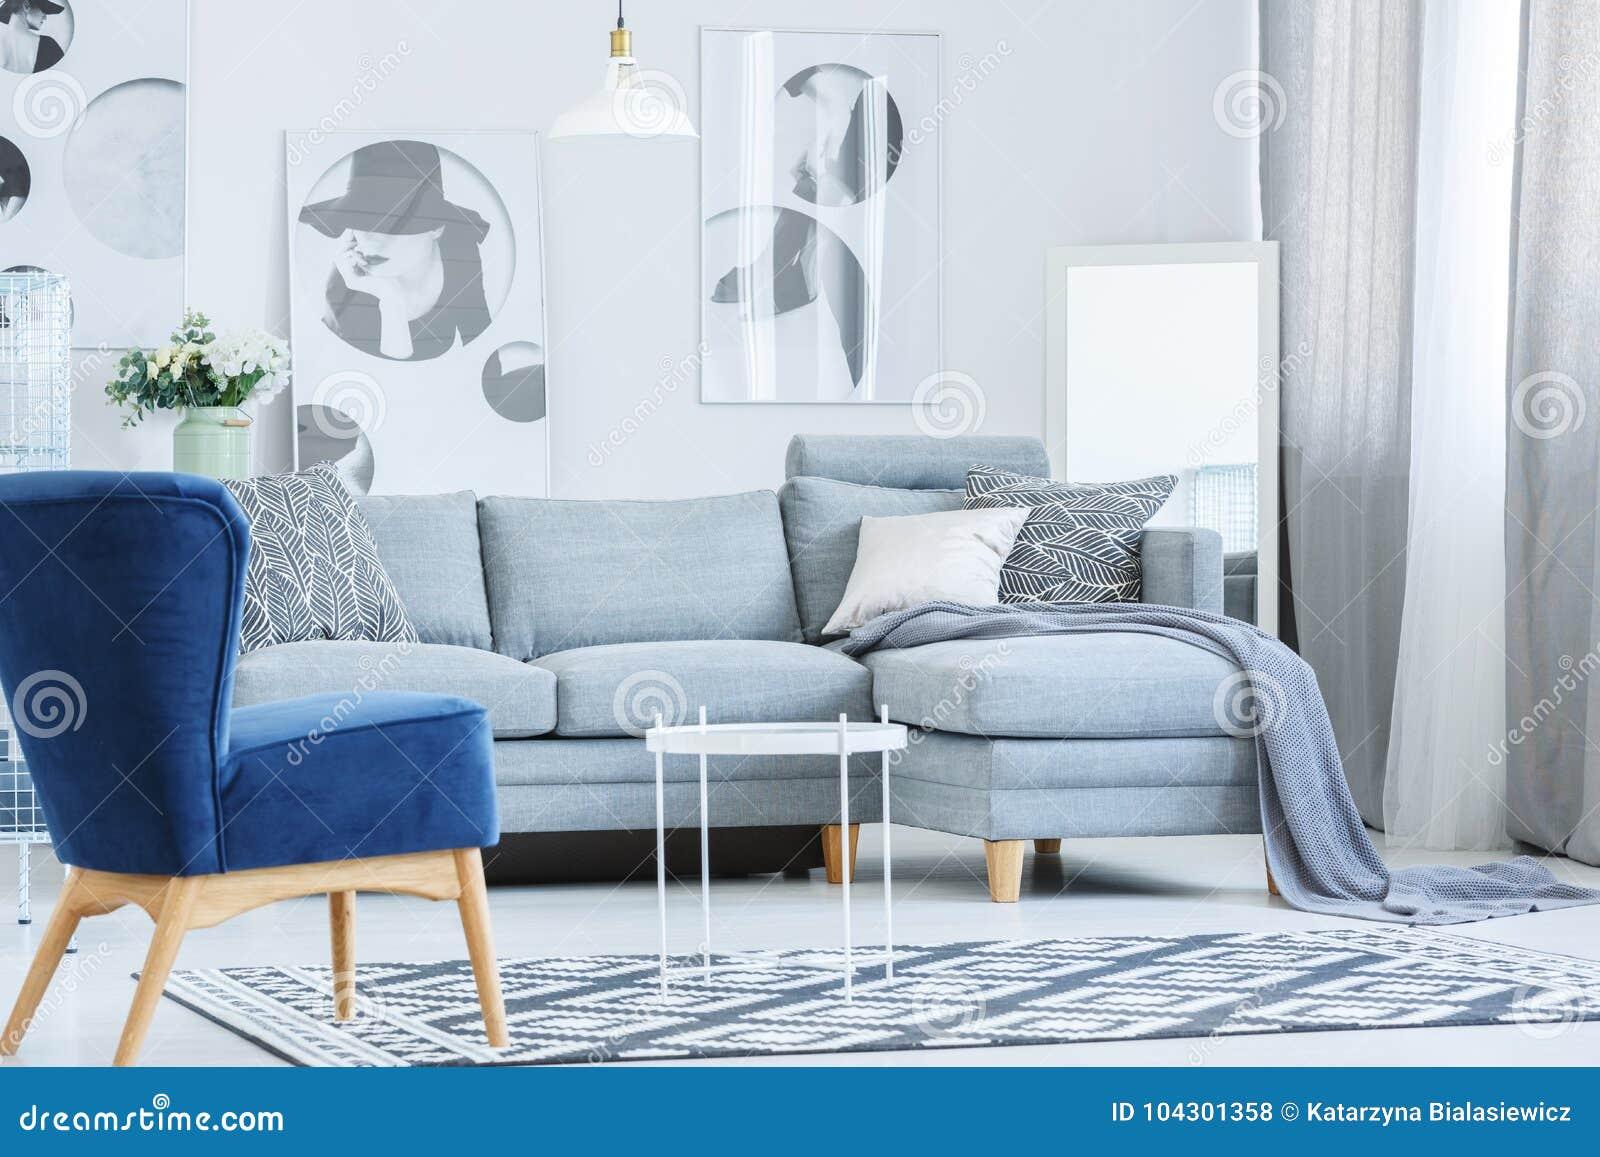 Stupendous Velvet Armchair In Gray Room Stock Photo Image Of Fashion Dailytribune Chair Design For Home Dailytribuneorg